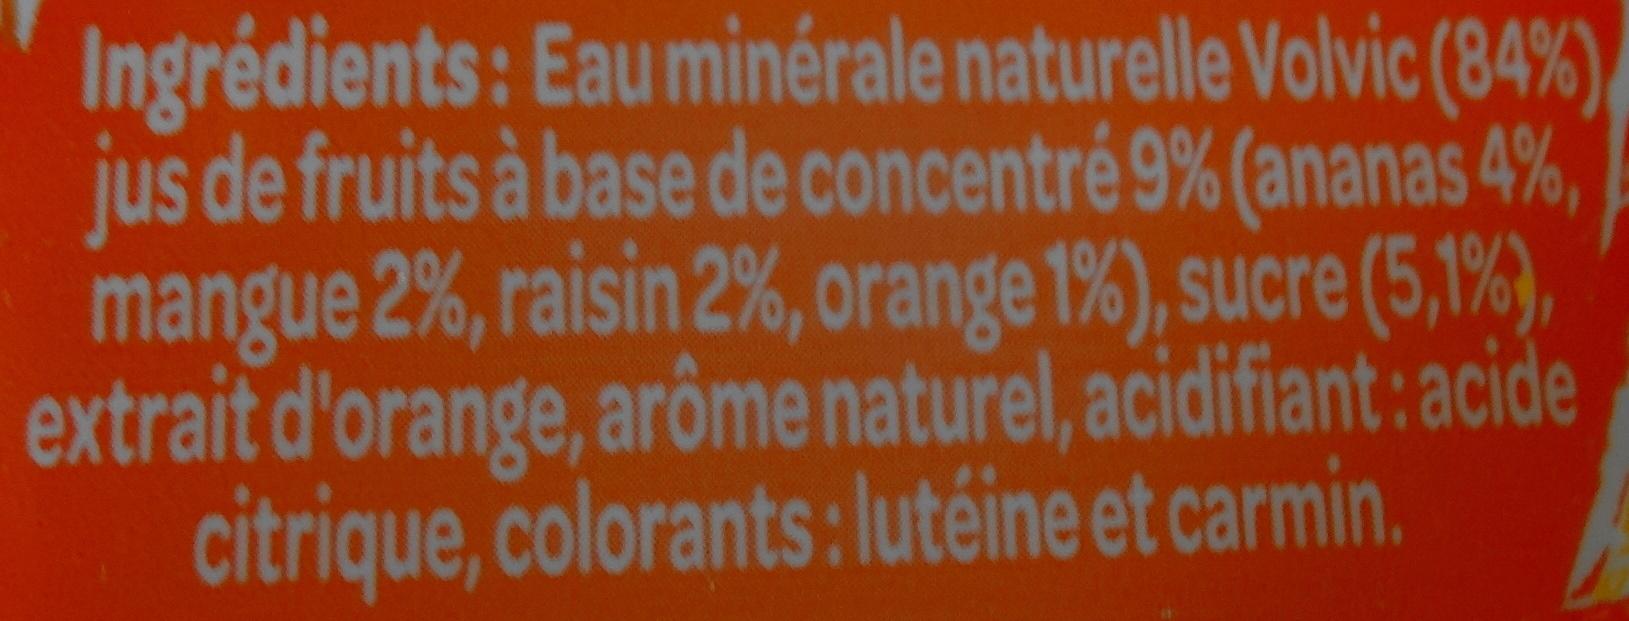 Juicy Fruits Exotiques - Ingrediënten